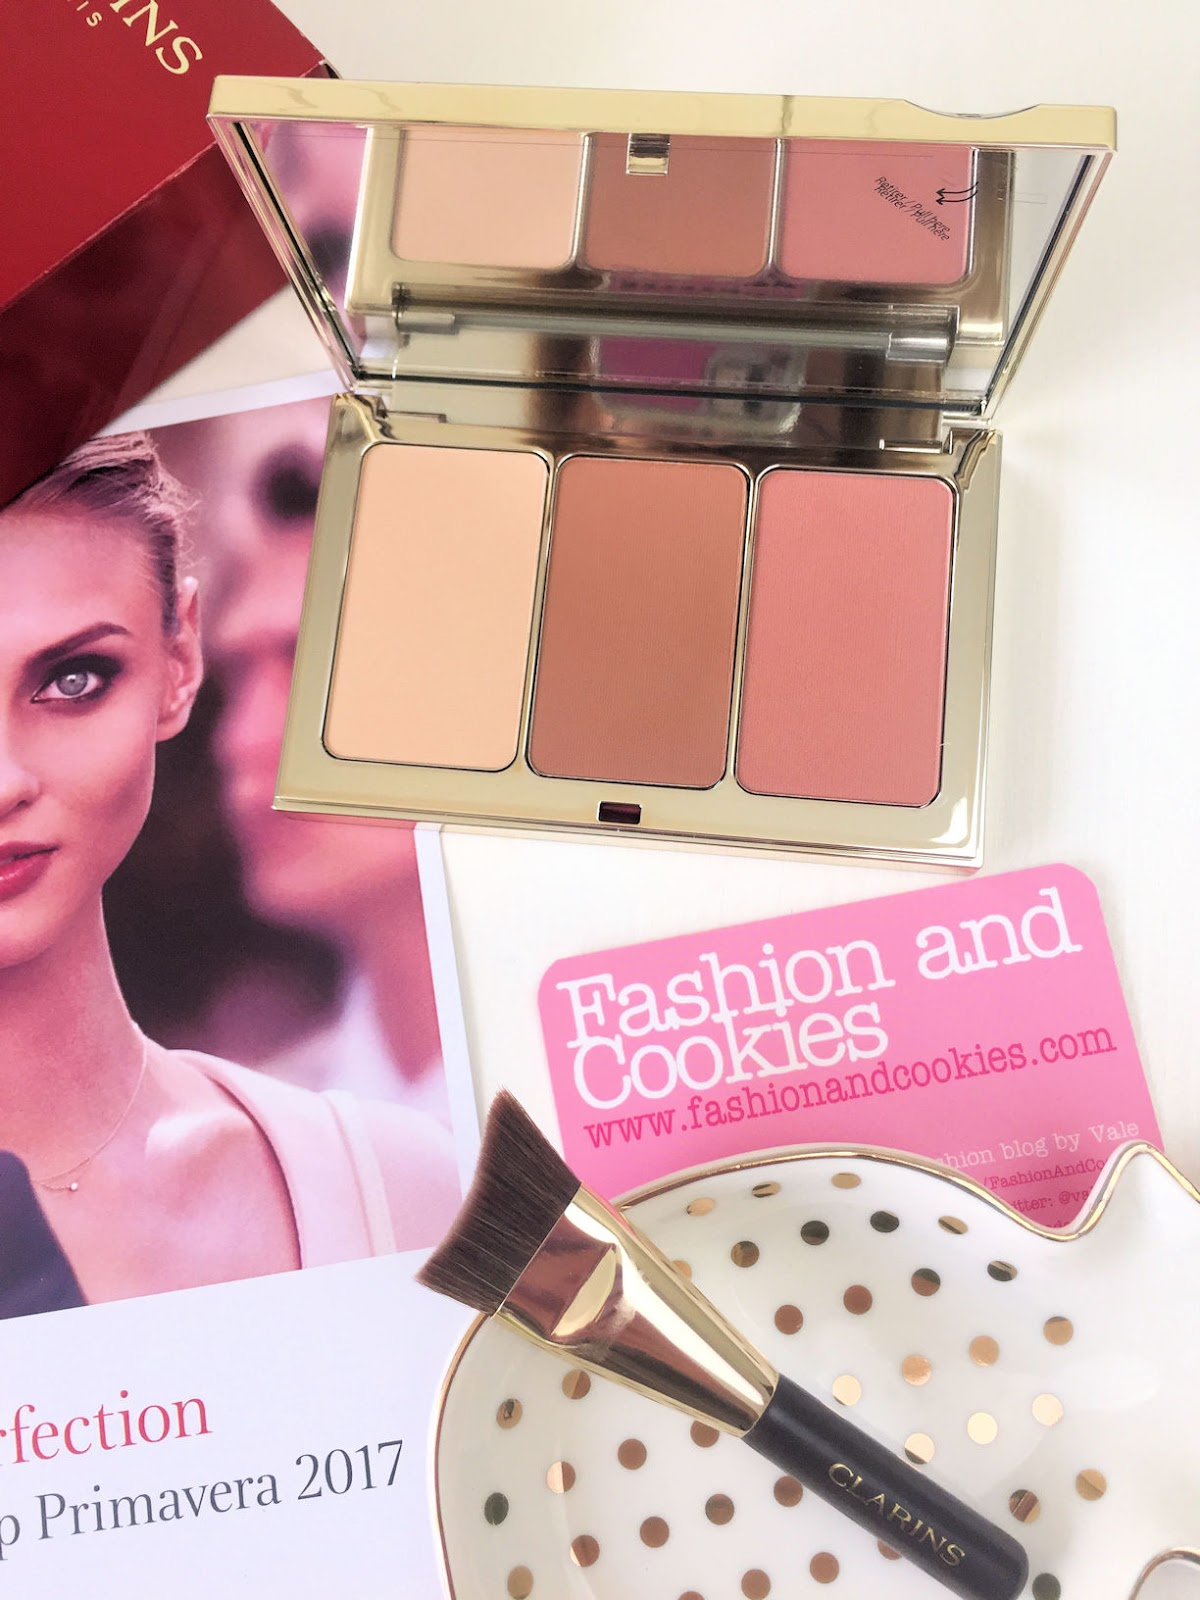 Clarins Palette Contour Visage makeup Spring 2017 su Fashion and Cookies beauty blog, beauty blogger